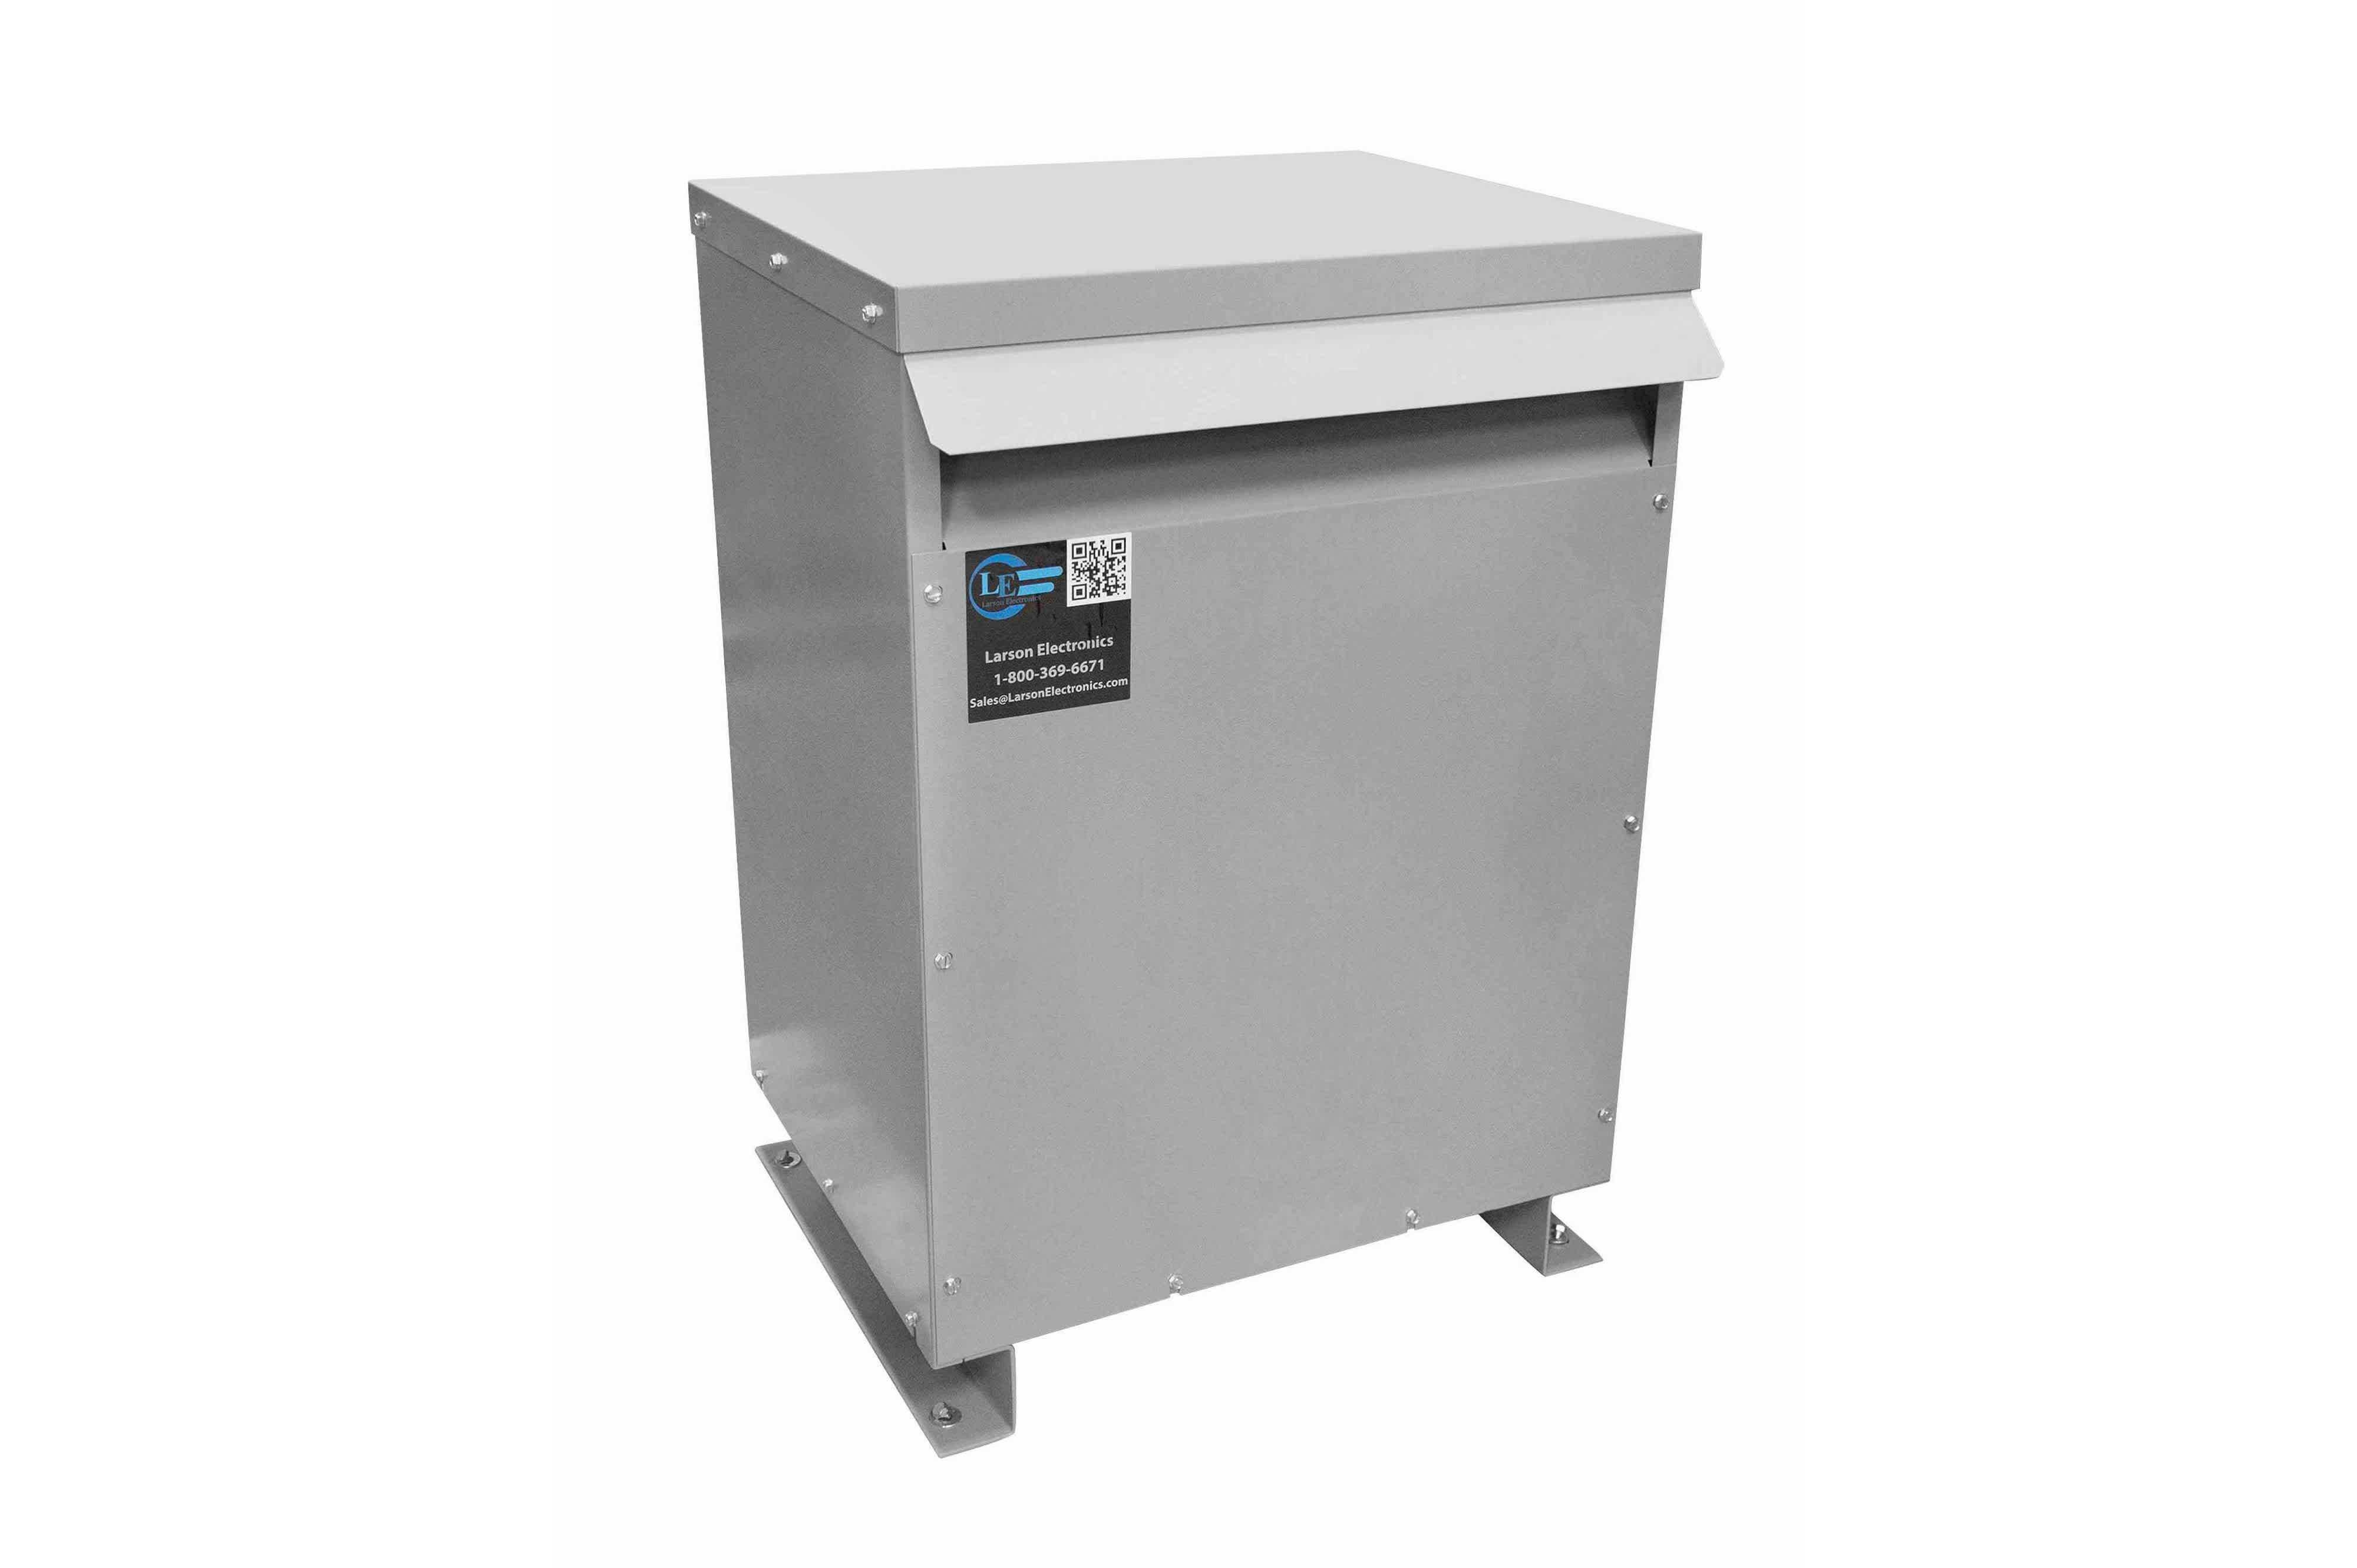 167 kVA 3PH Isolation Transformer, 575V Wye Primary, 380V Delta Secondary, N3R, Ventilated, 60 Hz